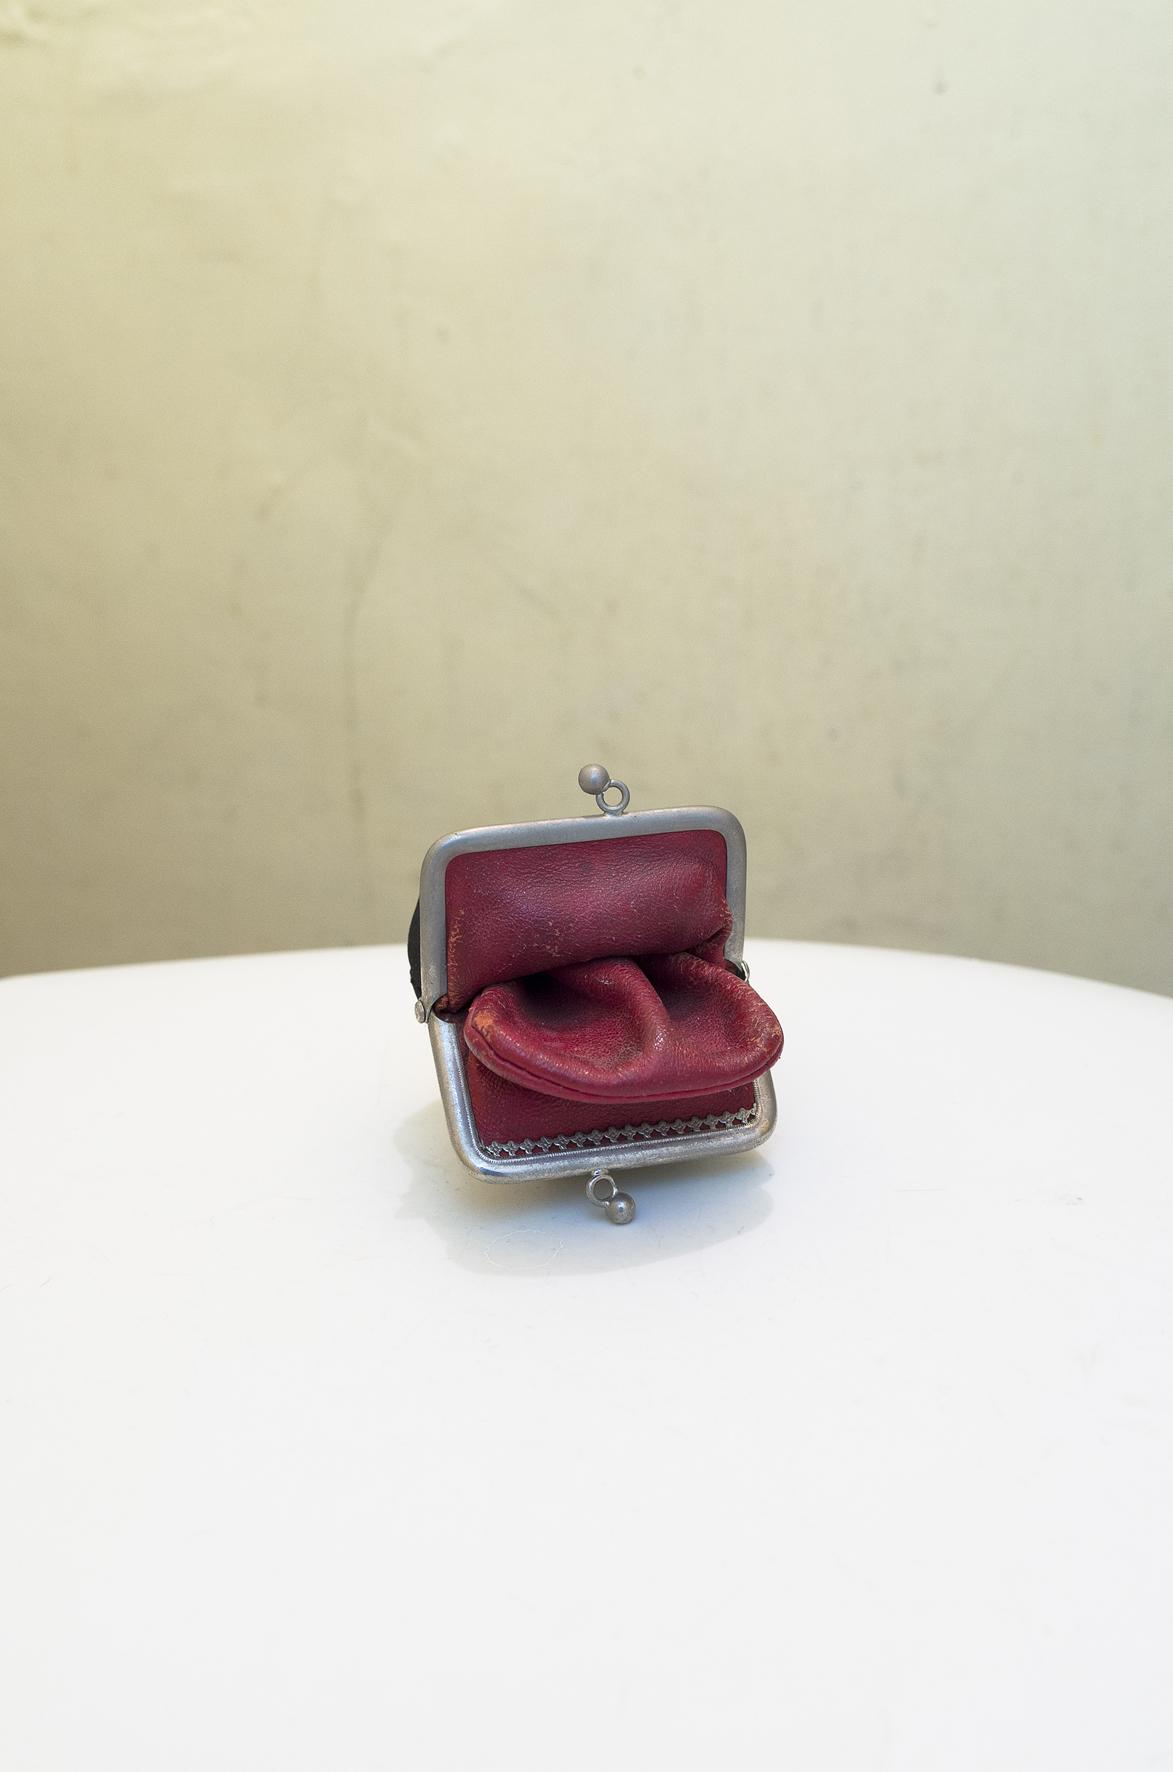 Desire, 2009, purse, 9 x 8 x 7cm